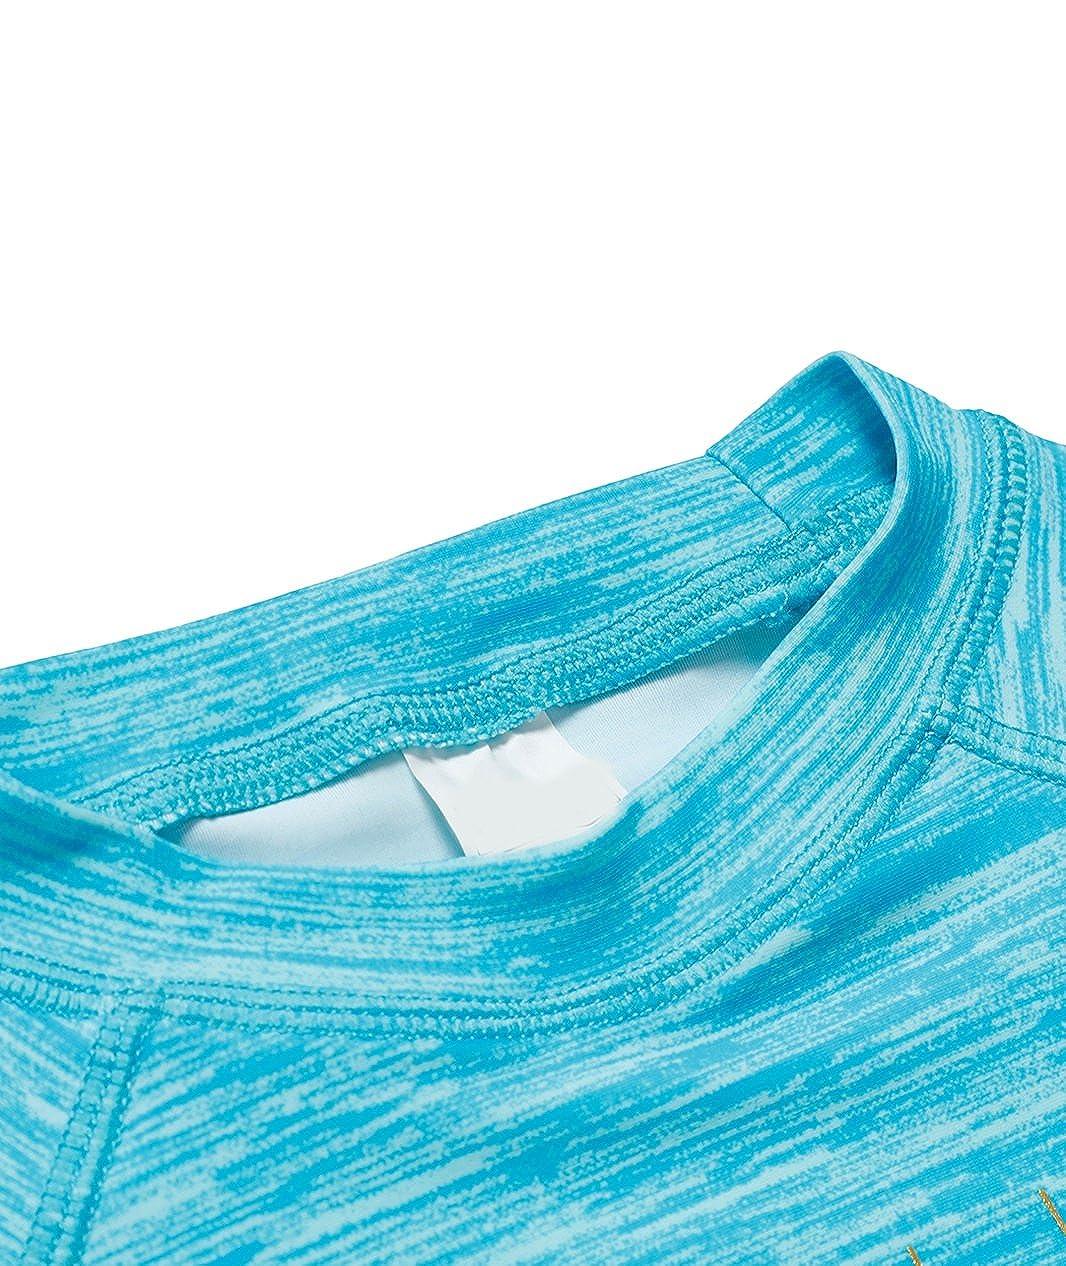 BELLOO Girls Long-Sleeve Rash Guard Swim Shirt Swimsuit Swimwear for 6-16 Years